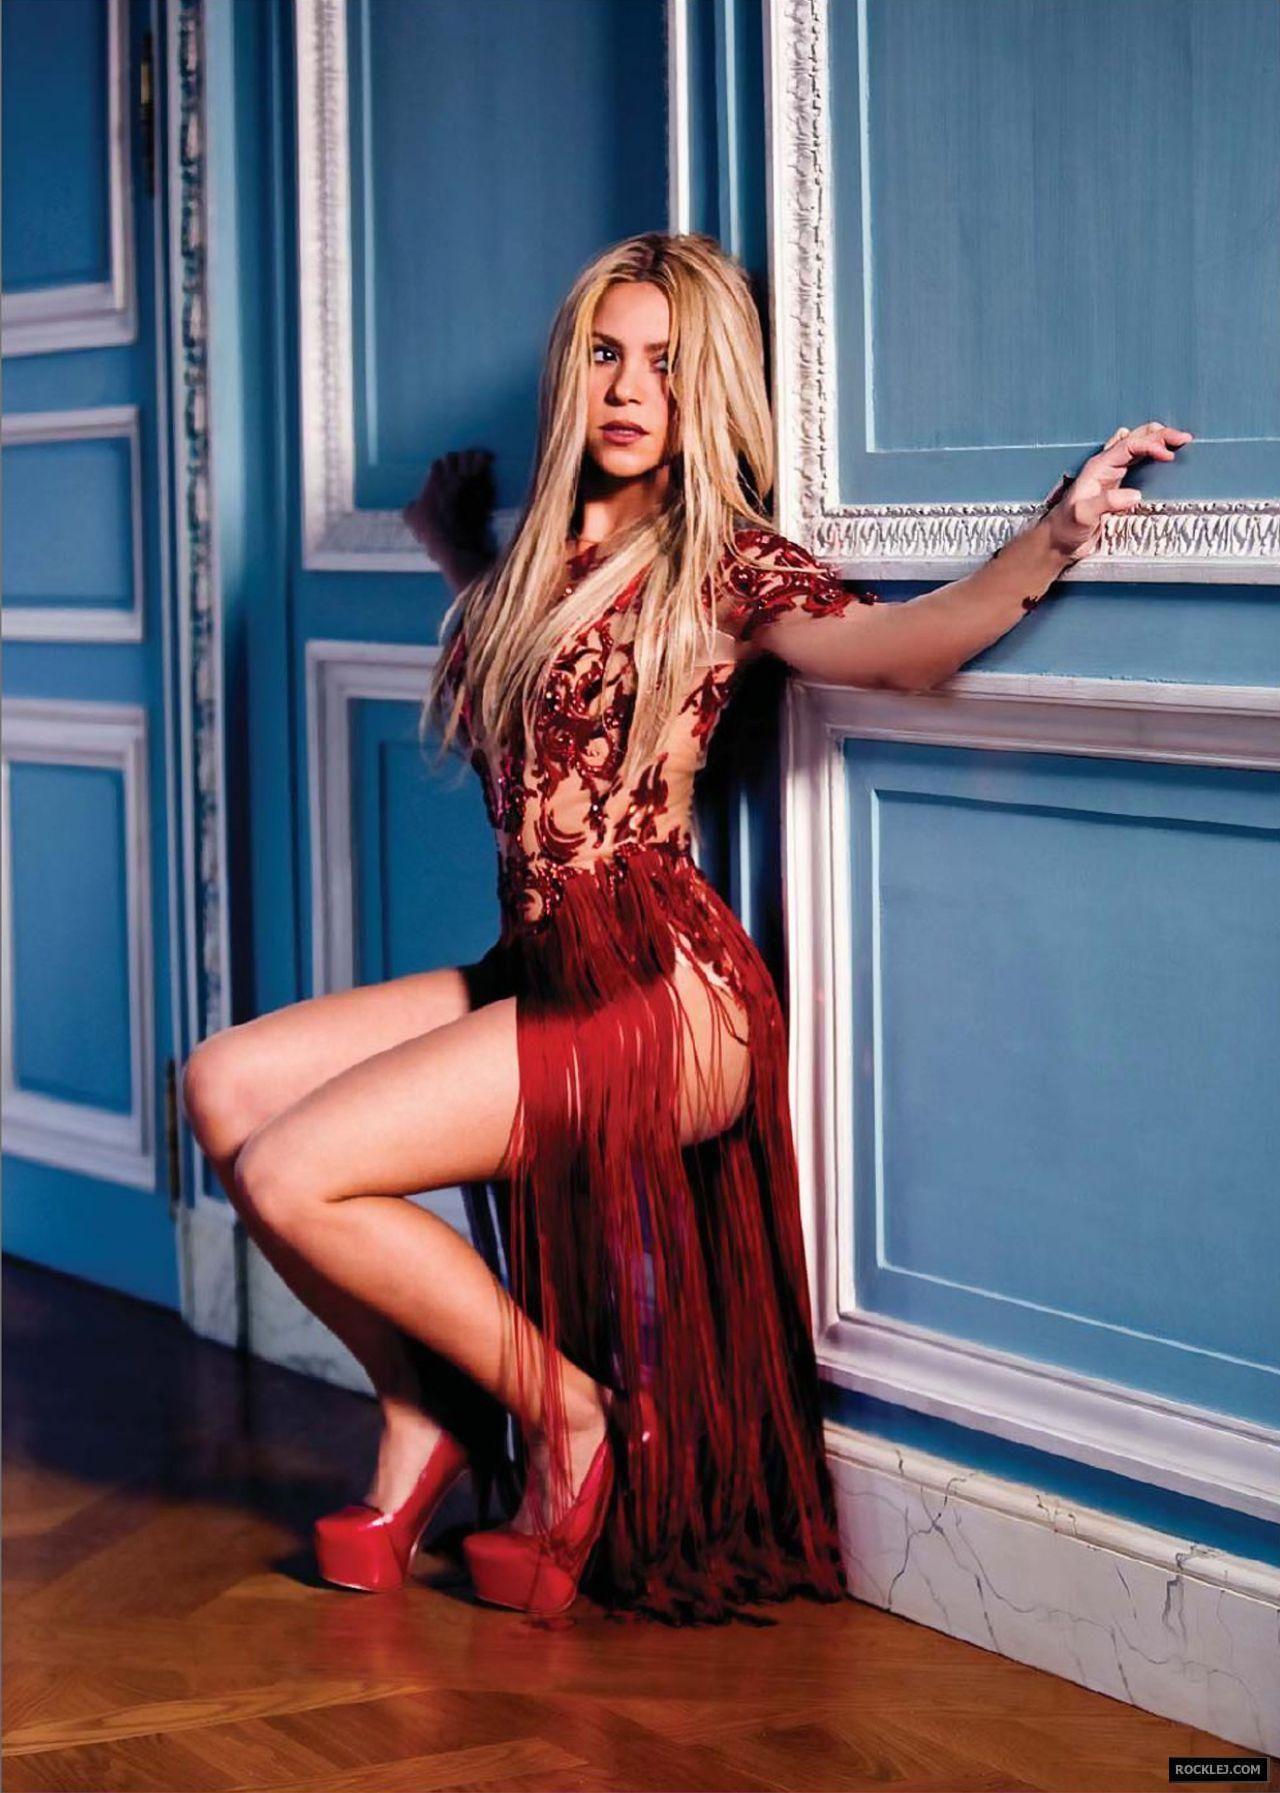 Shakira Hottest Photoshoot  Shakira Hot Bikini Photoshoot For -2343